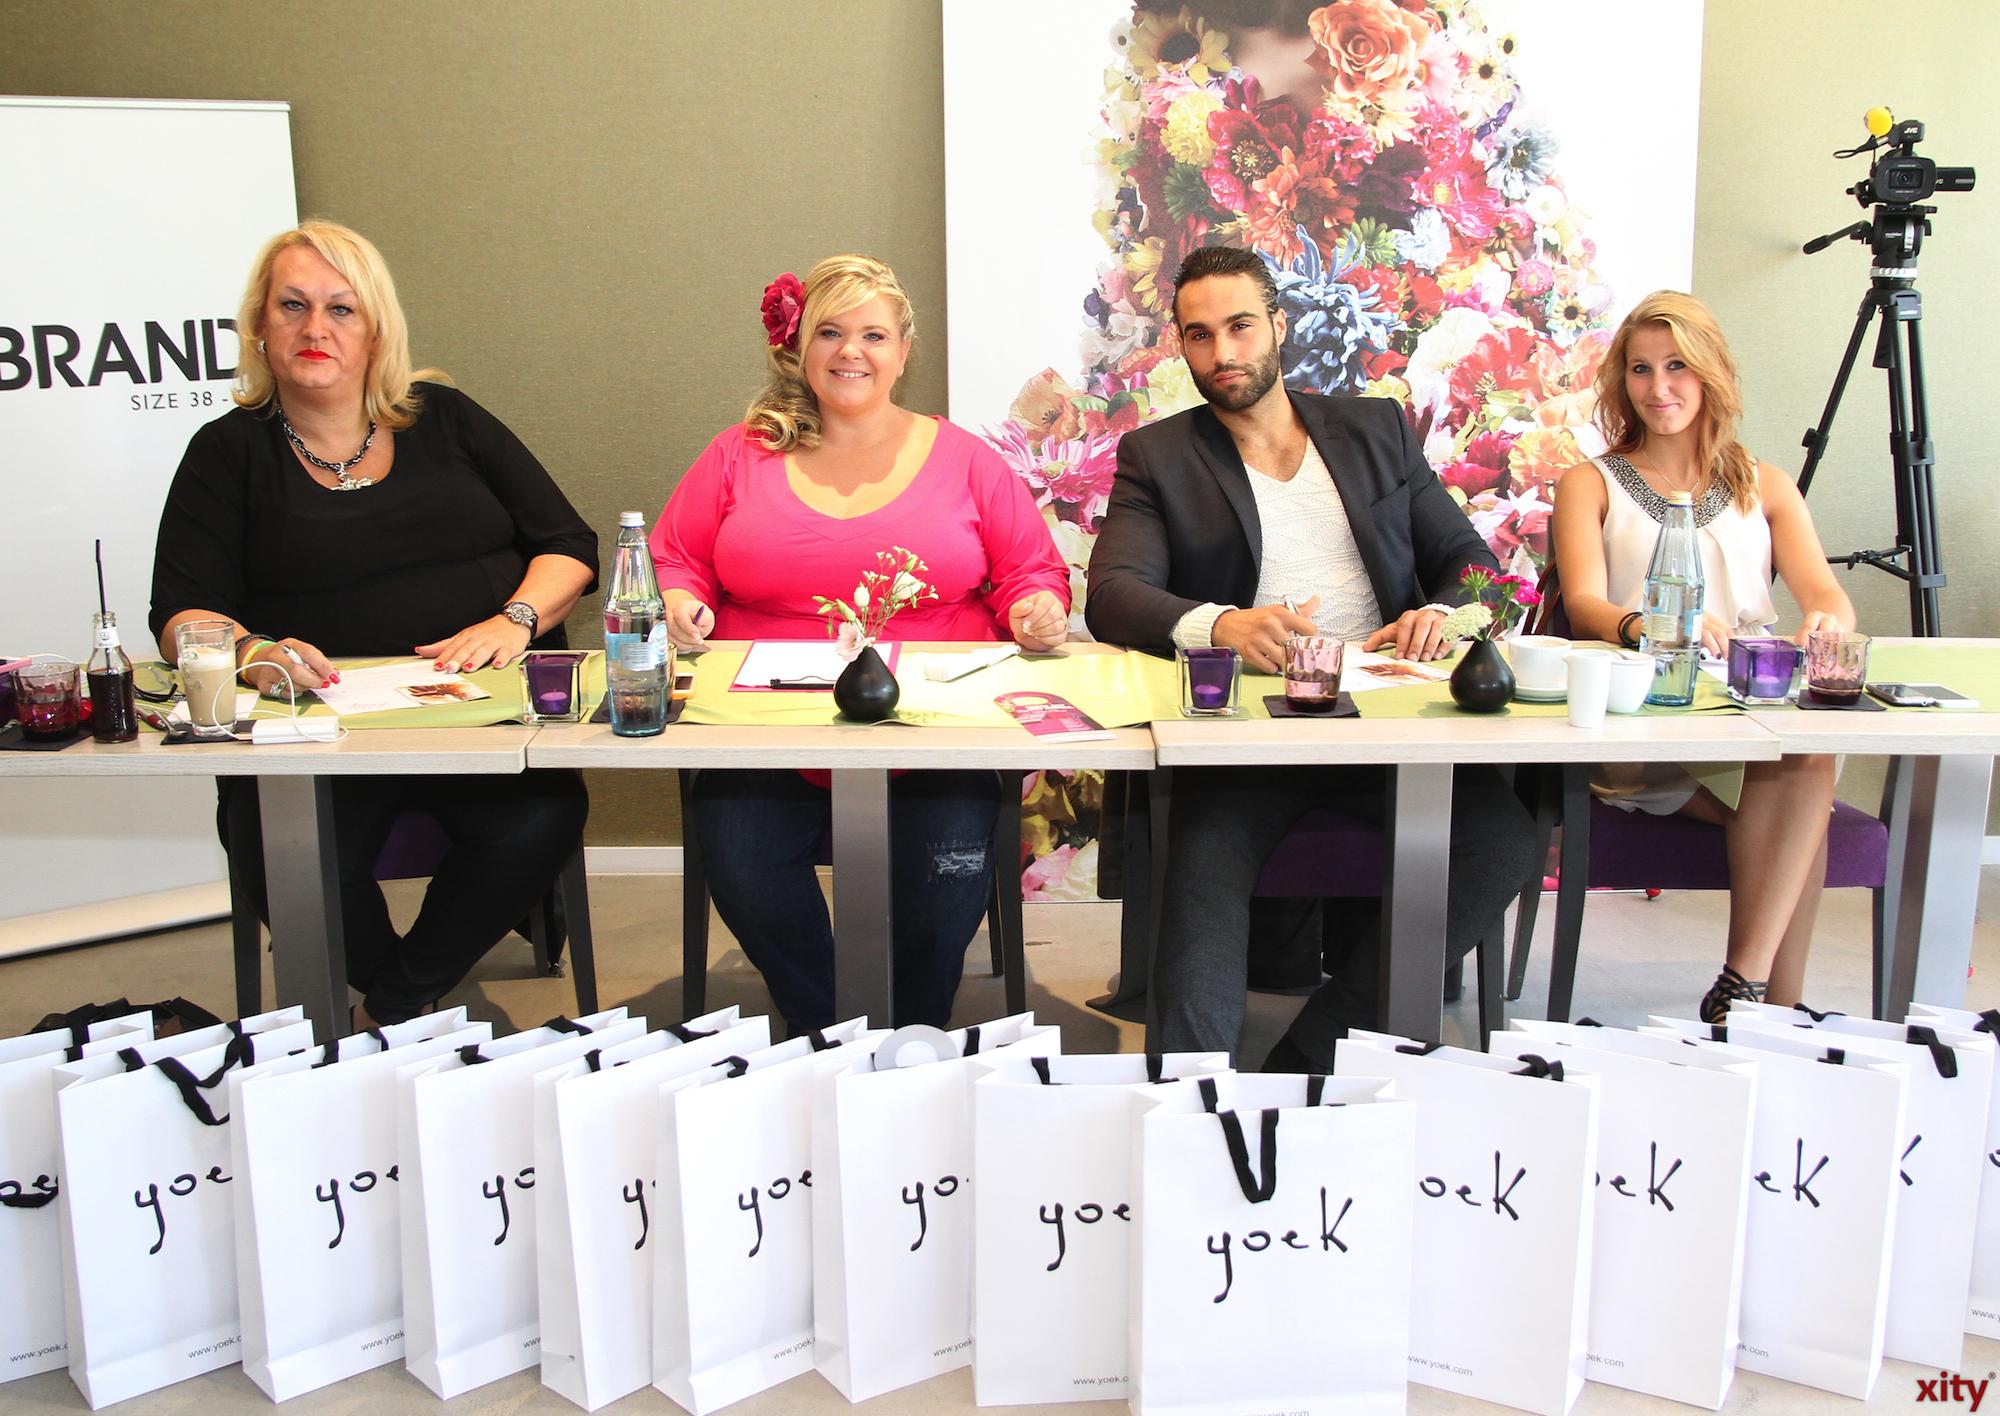 The jury included Käthe Köstlich, David Ortega Arenas, Karolin Grun and Melanie Hauptmanns (Foto: xity)